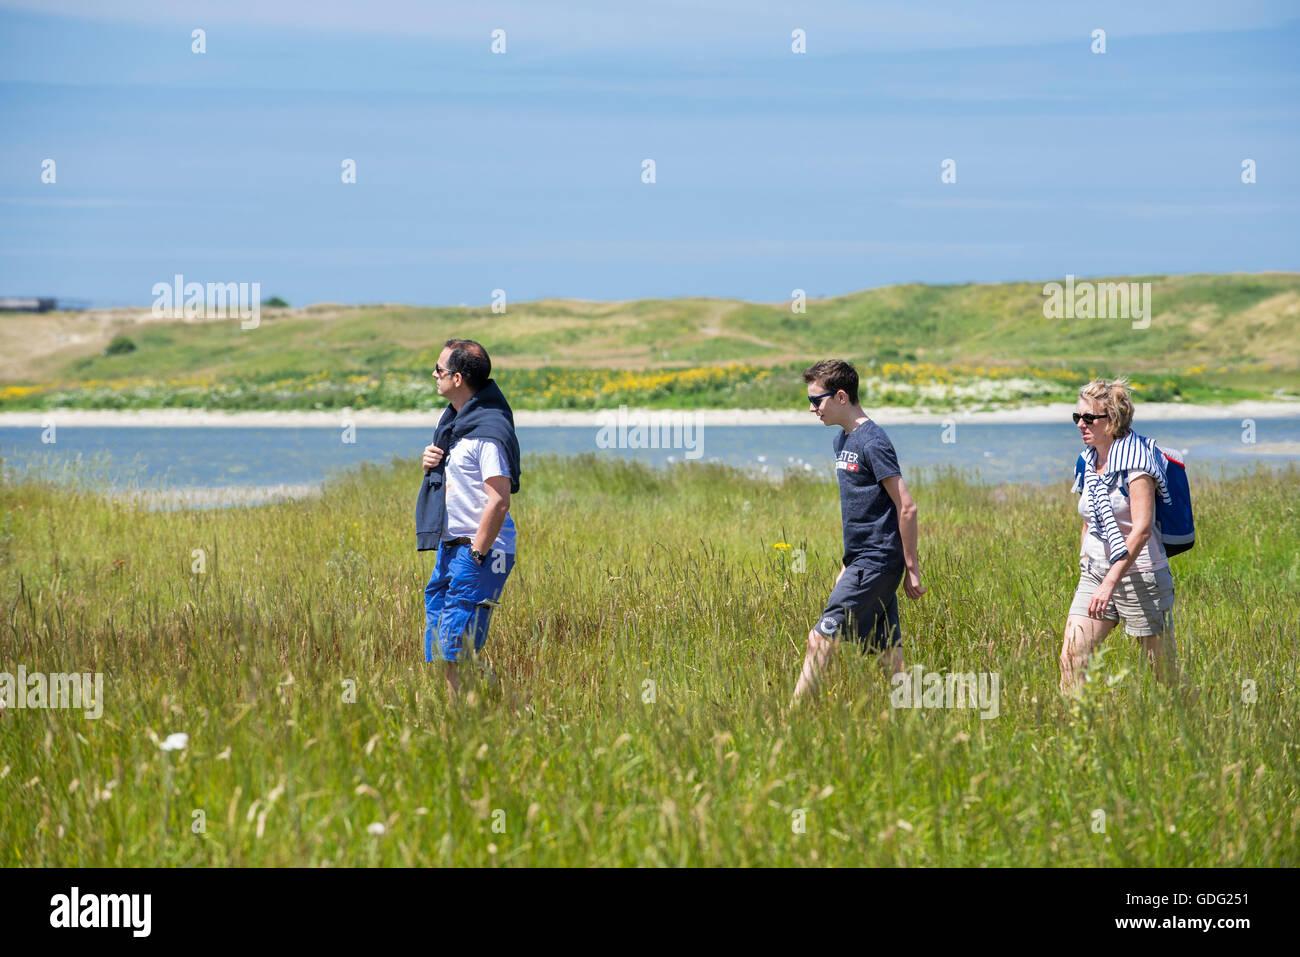 Visitors walking in saltmarsh at the Zwin Nature Park, bird sanctuary at Knokke-Heist, West Flanders, Belgium - Stock Image